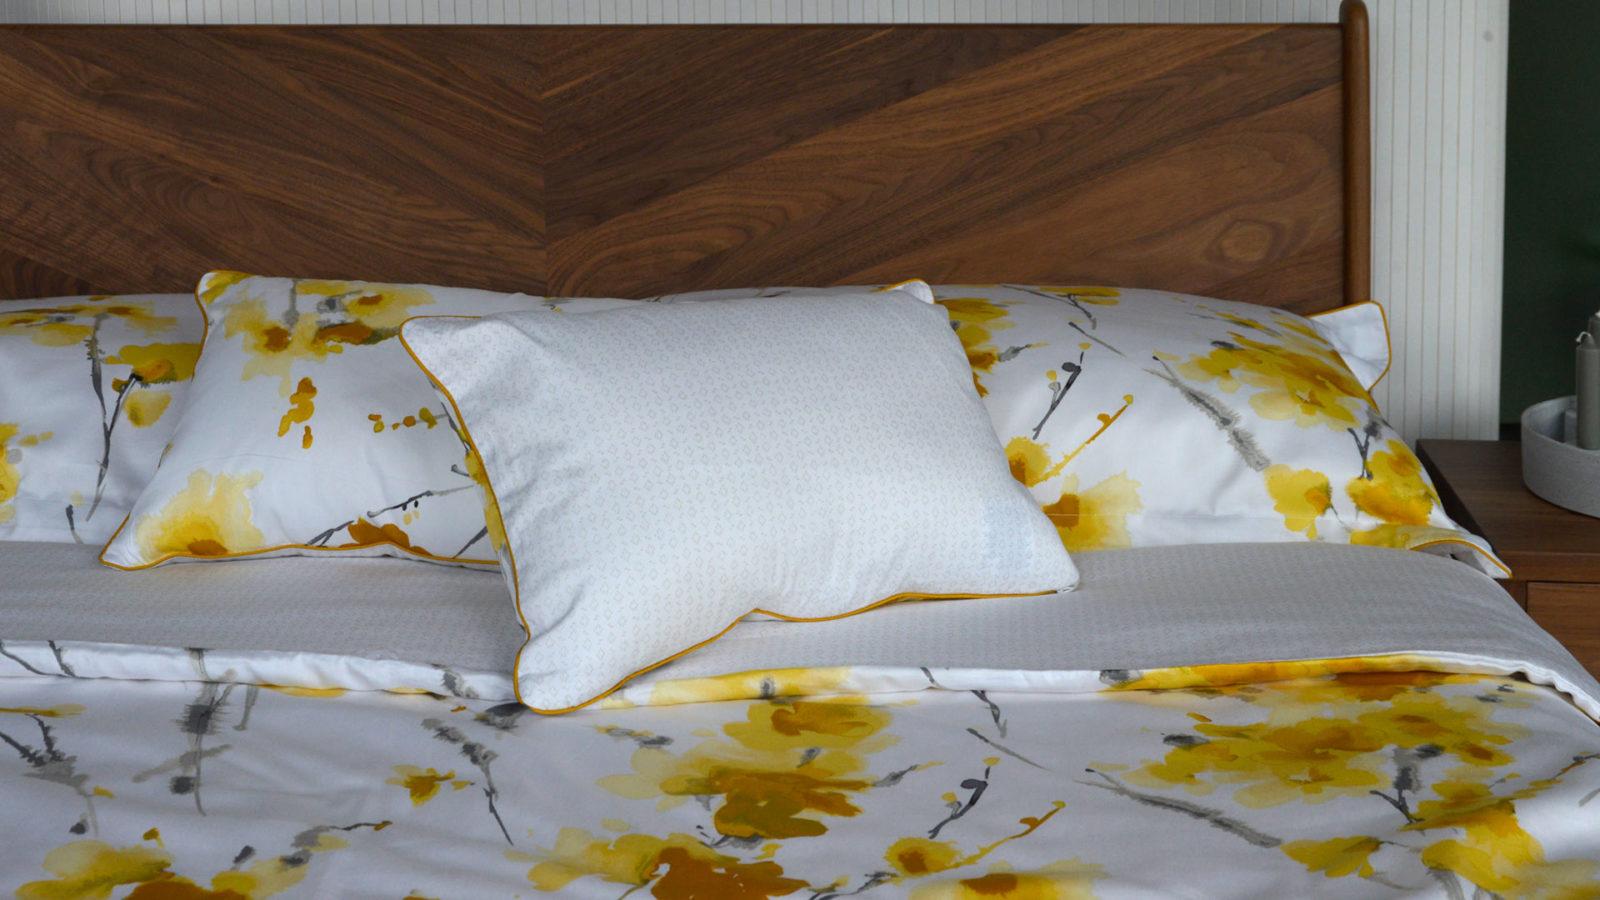 reversible-cushion-to-match-yellow-flowers-duvet